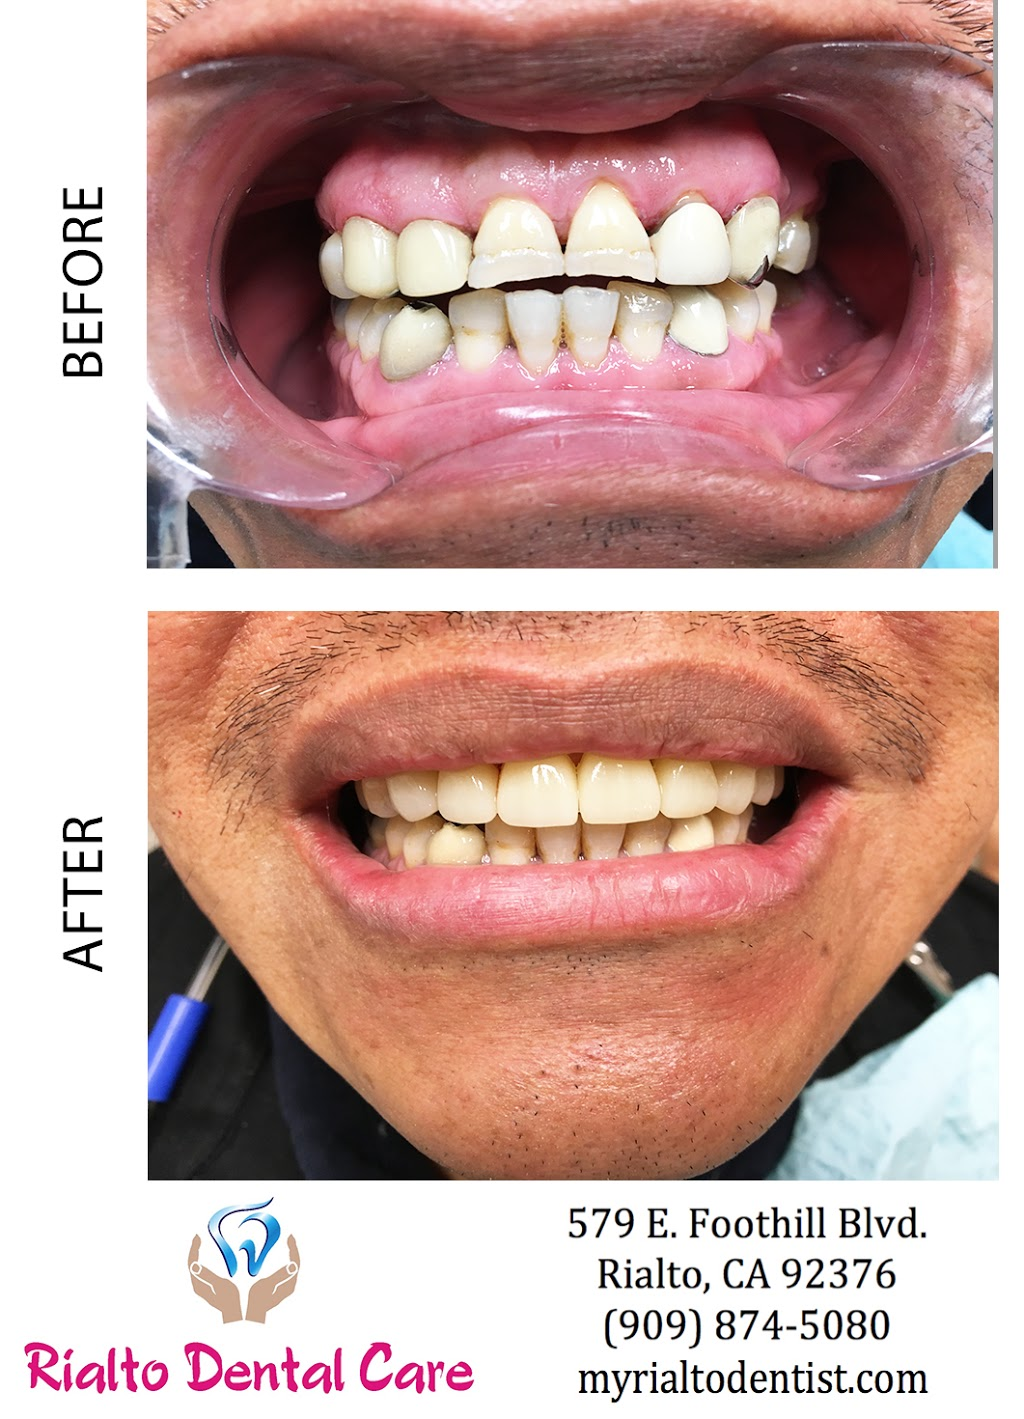 Rialto Dental Care - dentist    Photo 9 of 10   Address: Stater Bros. shopping center, 579 E Foothill Blvd, Rialto, CA 92376, USA   Phone: (909) 874-5080